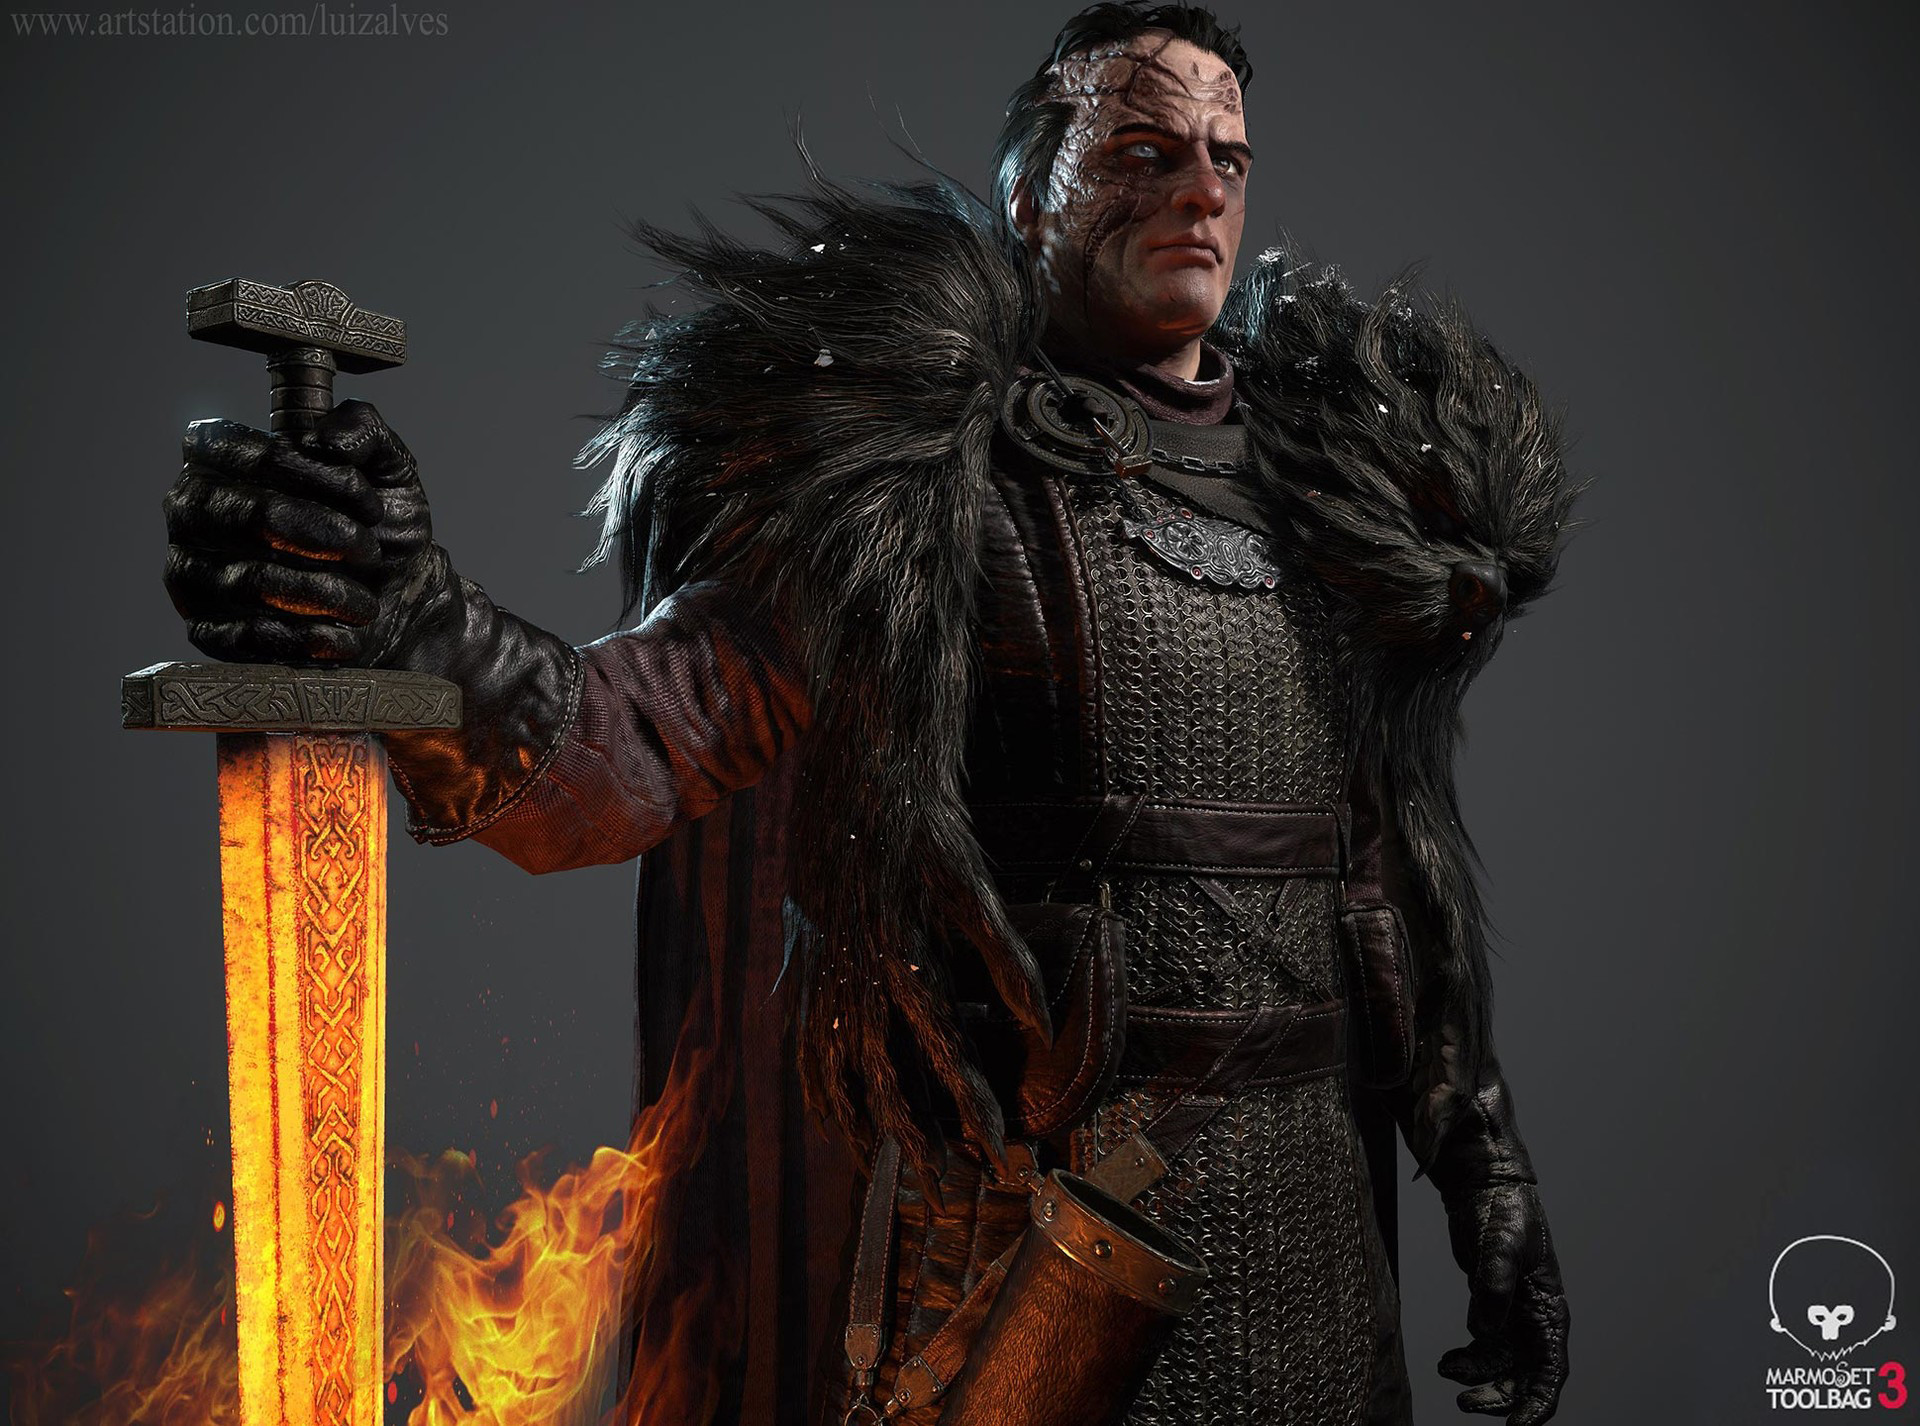 Jarl Game Of Thrones